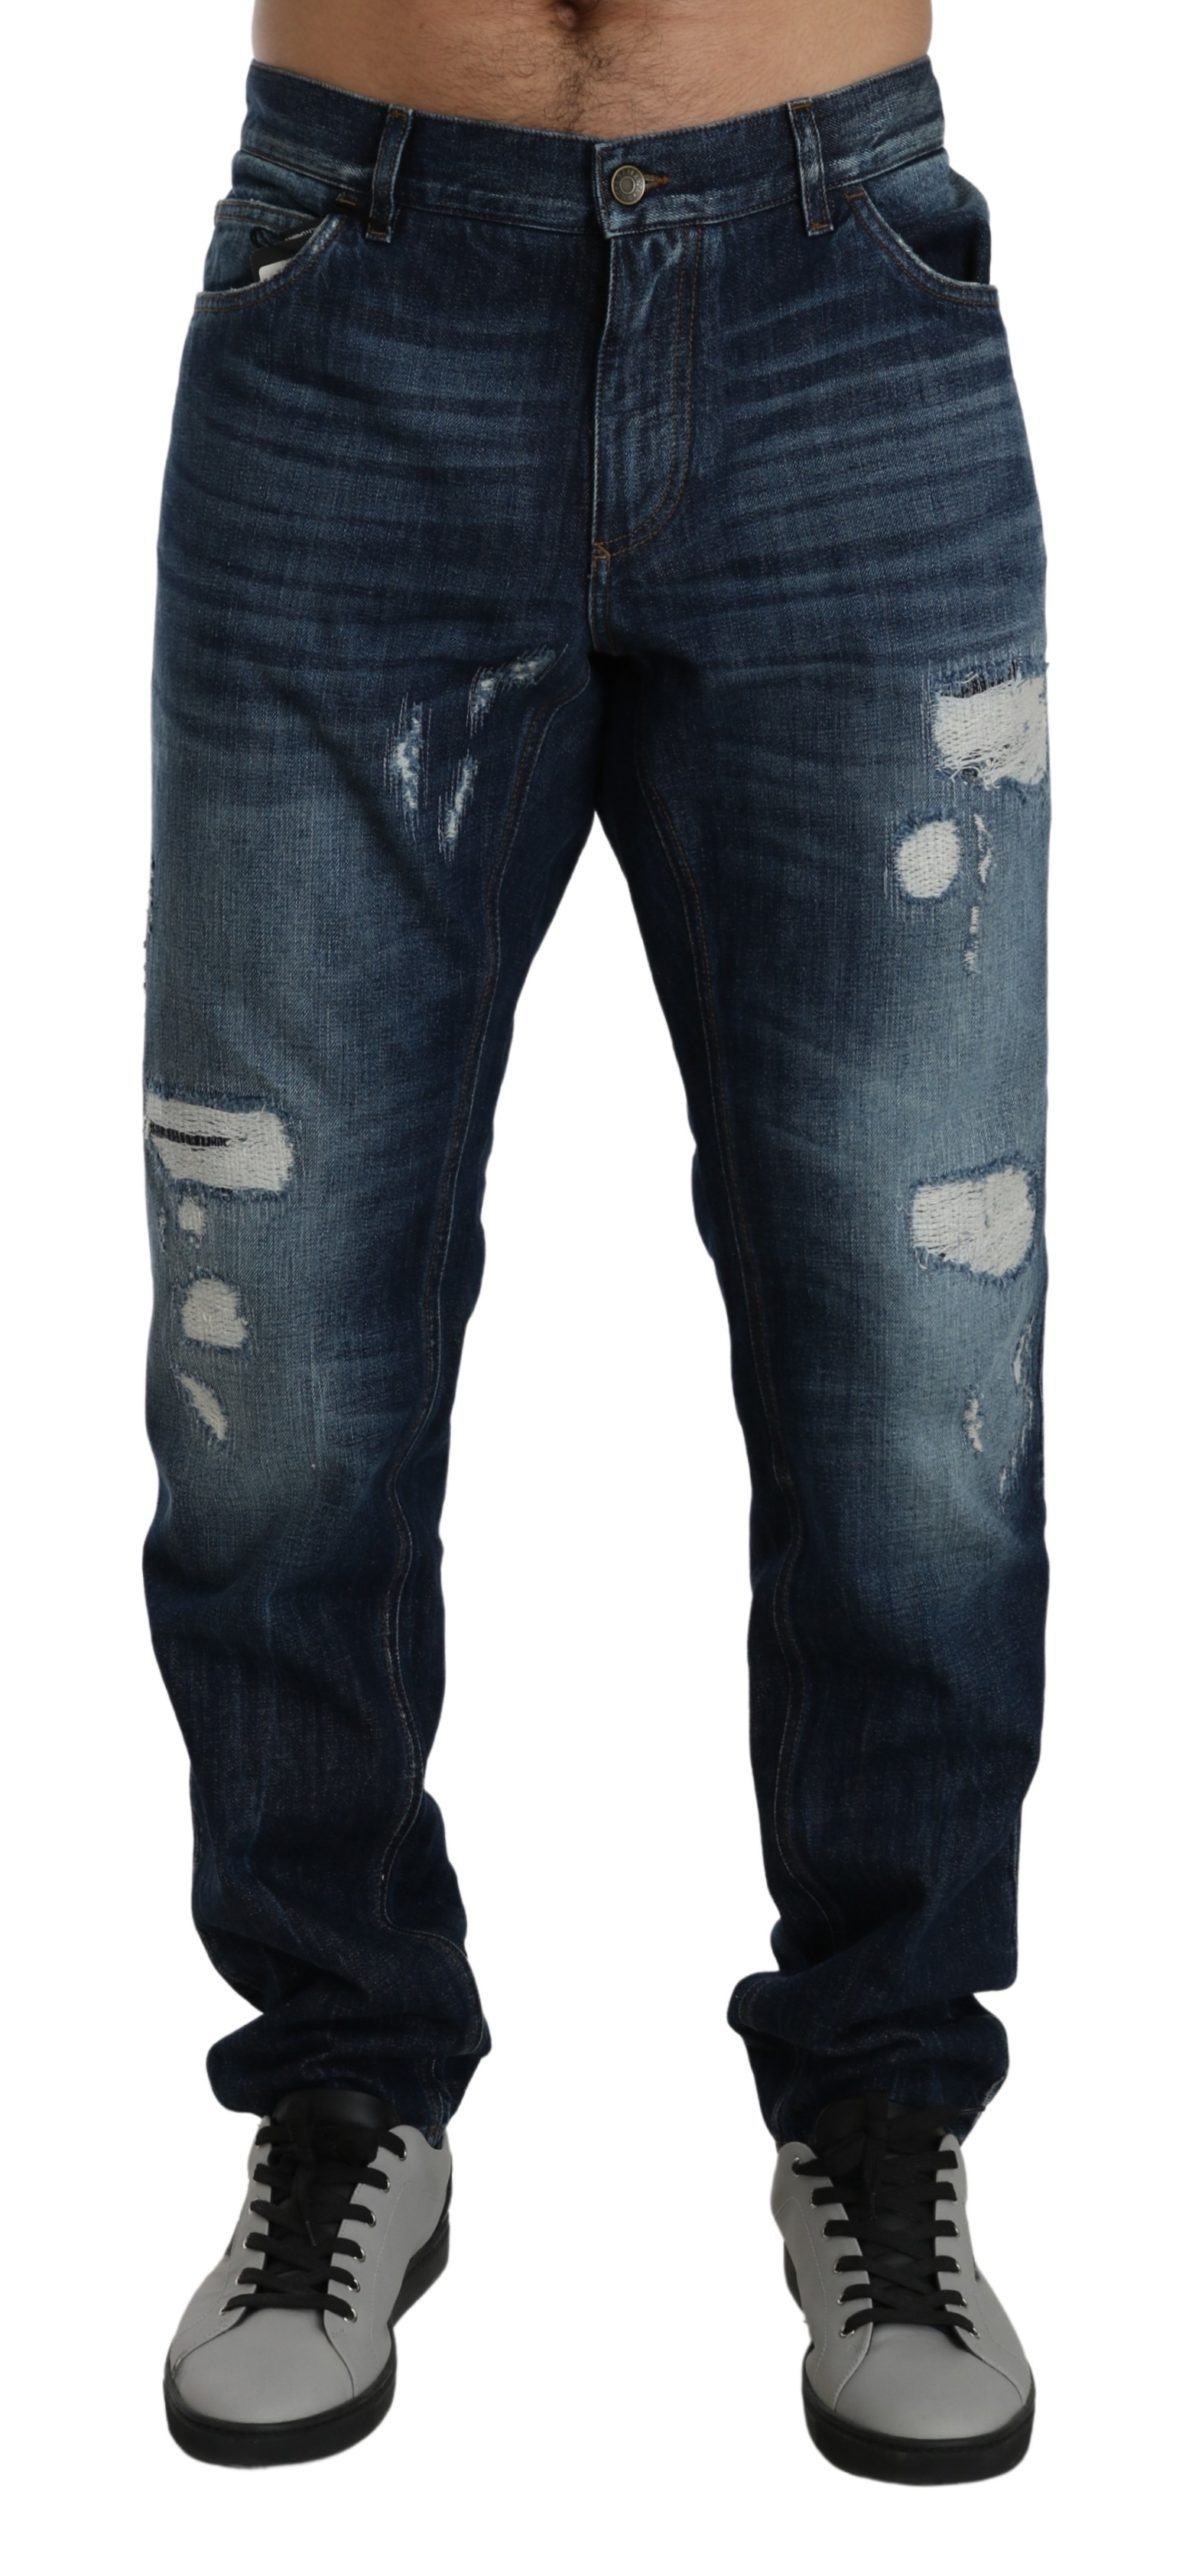 Dolce & Gabbana Men's Ripped Classic Denim Cotton Jeans Blue PAN71414 - IT56 | XXL